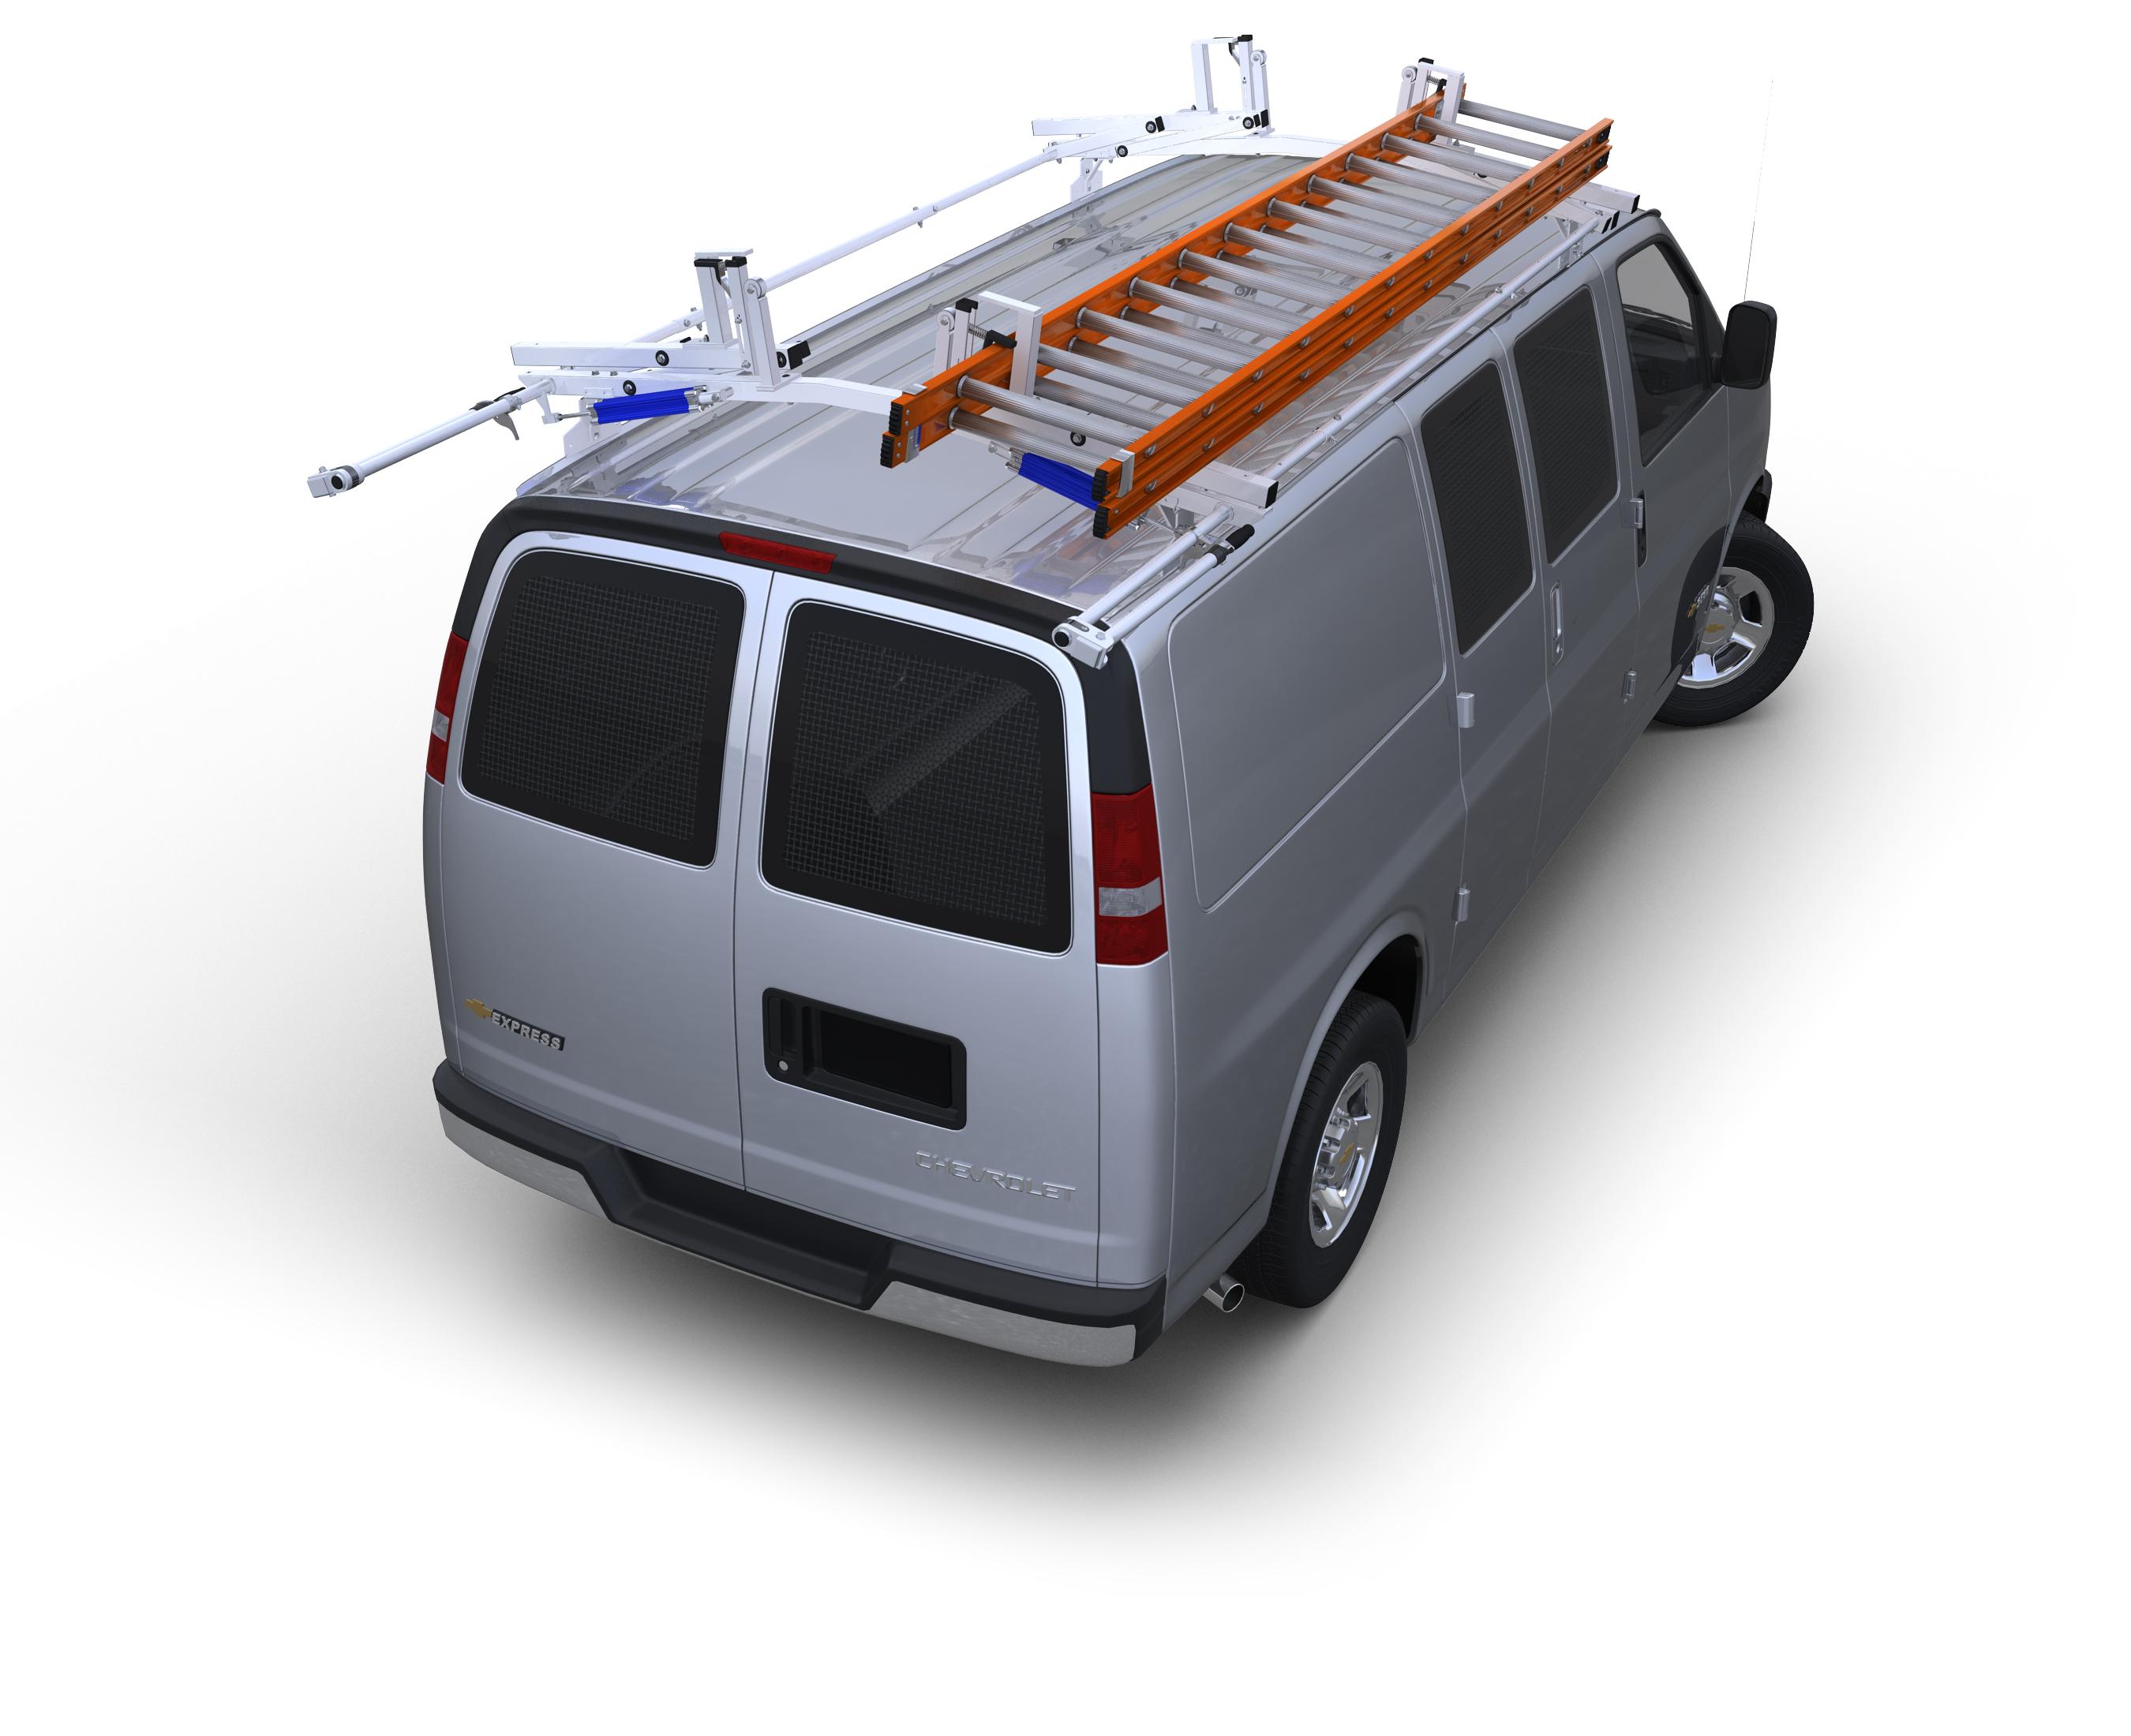 Tripp Lite 2000 Watt Utility/Work Truck Inverter Charger